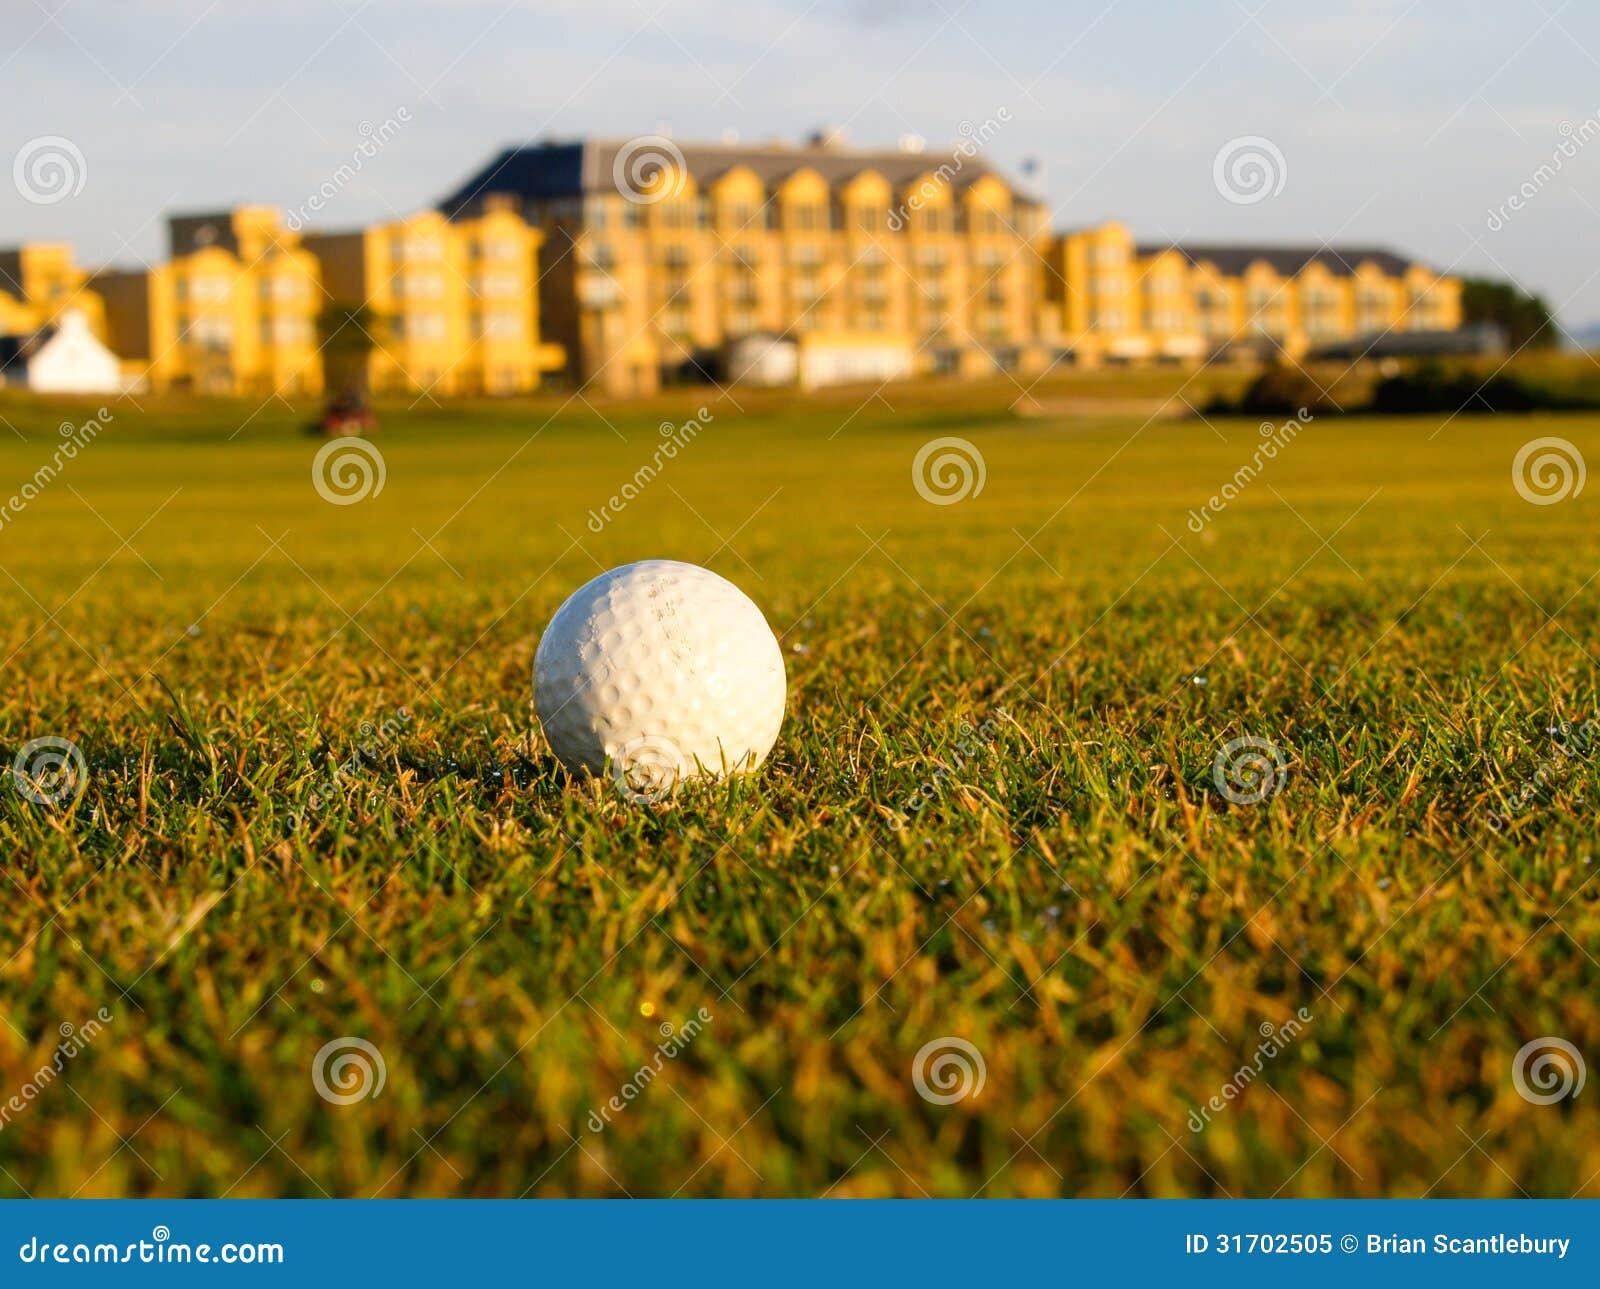 Golf ball lies in fairway.